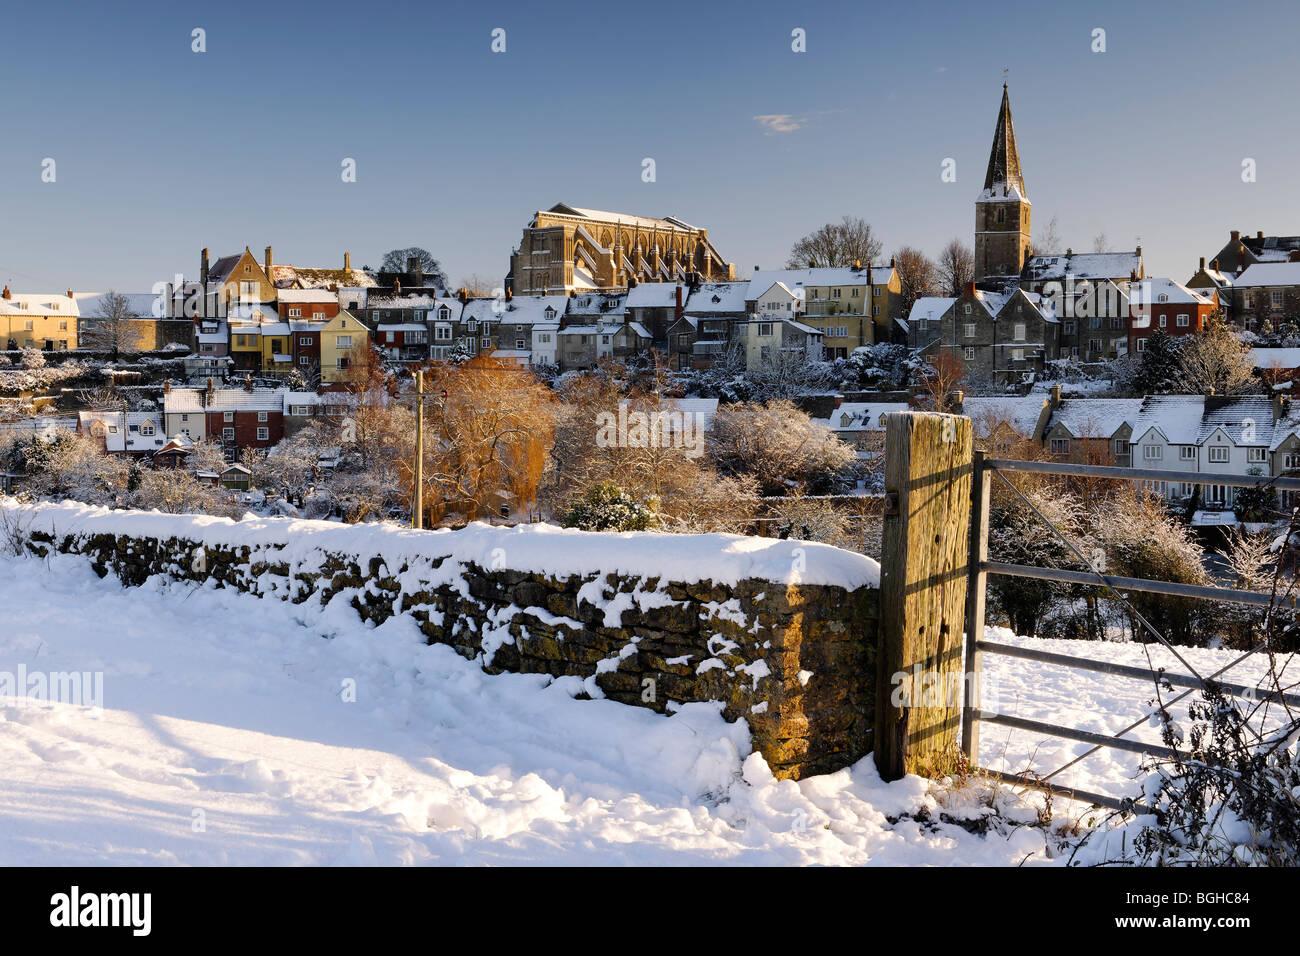 Malmesbury under snow. - Stock Image